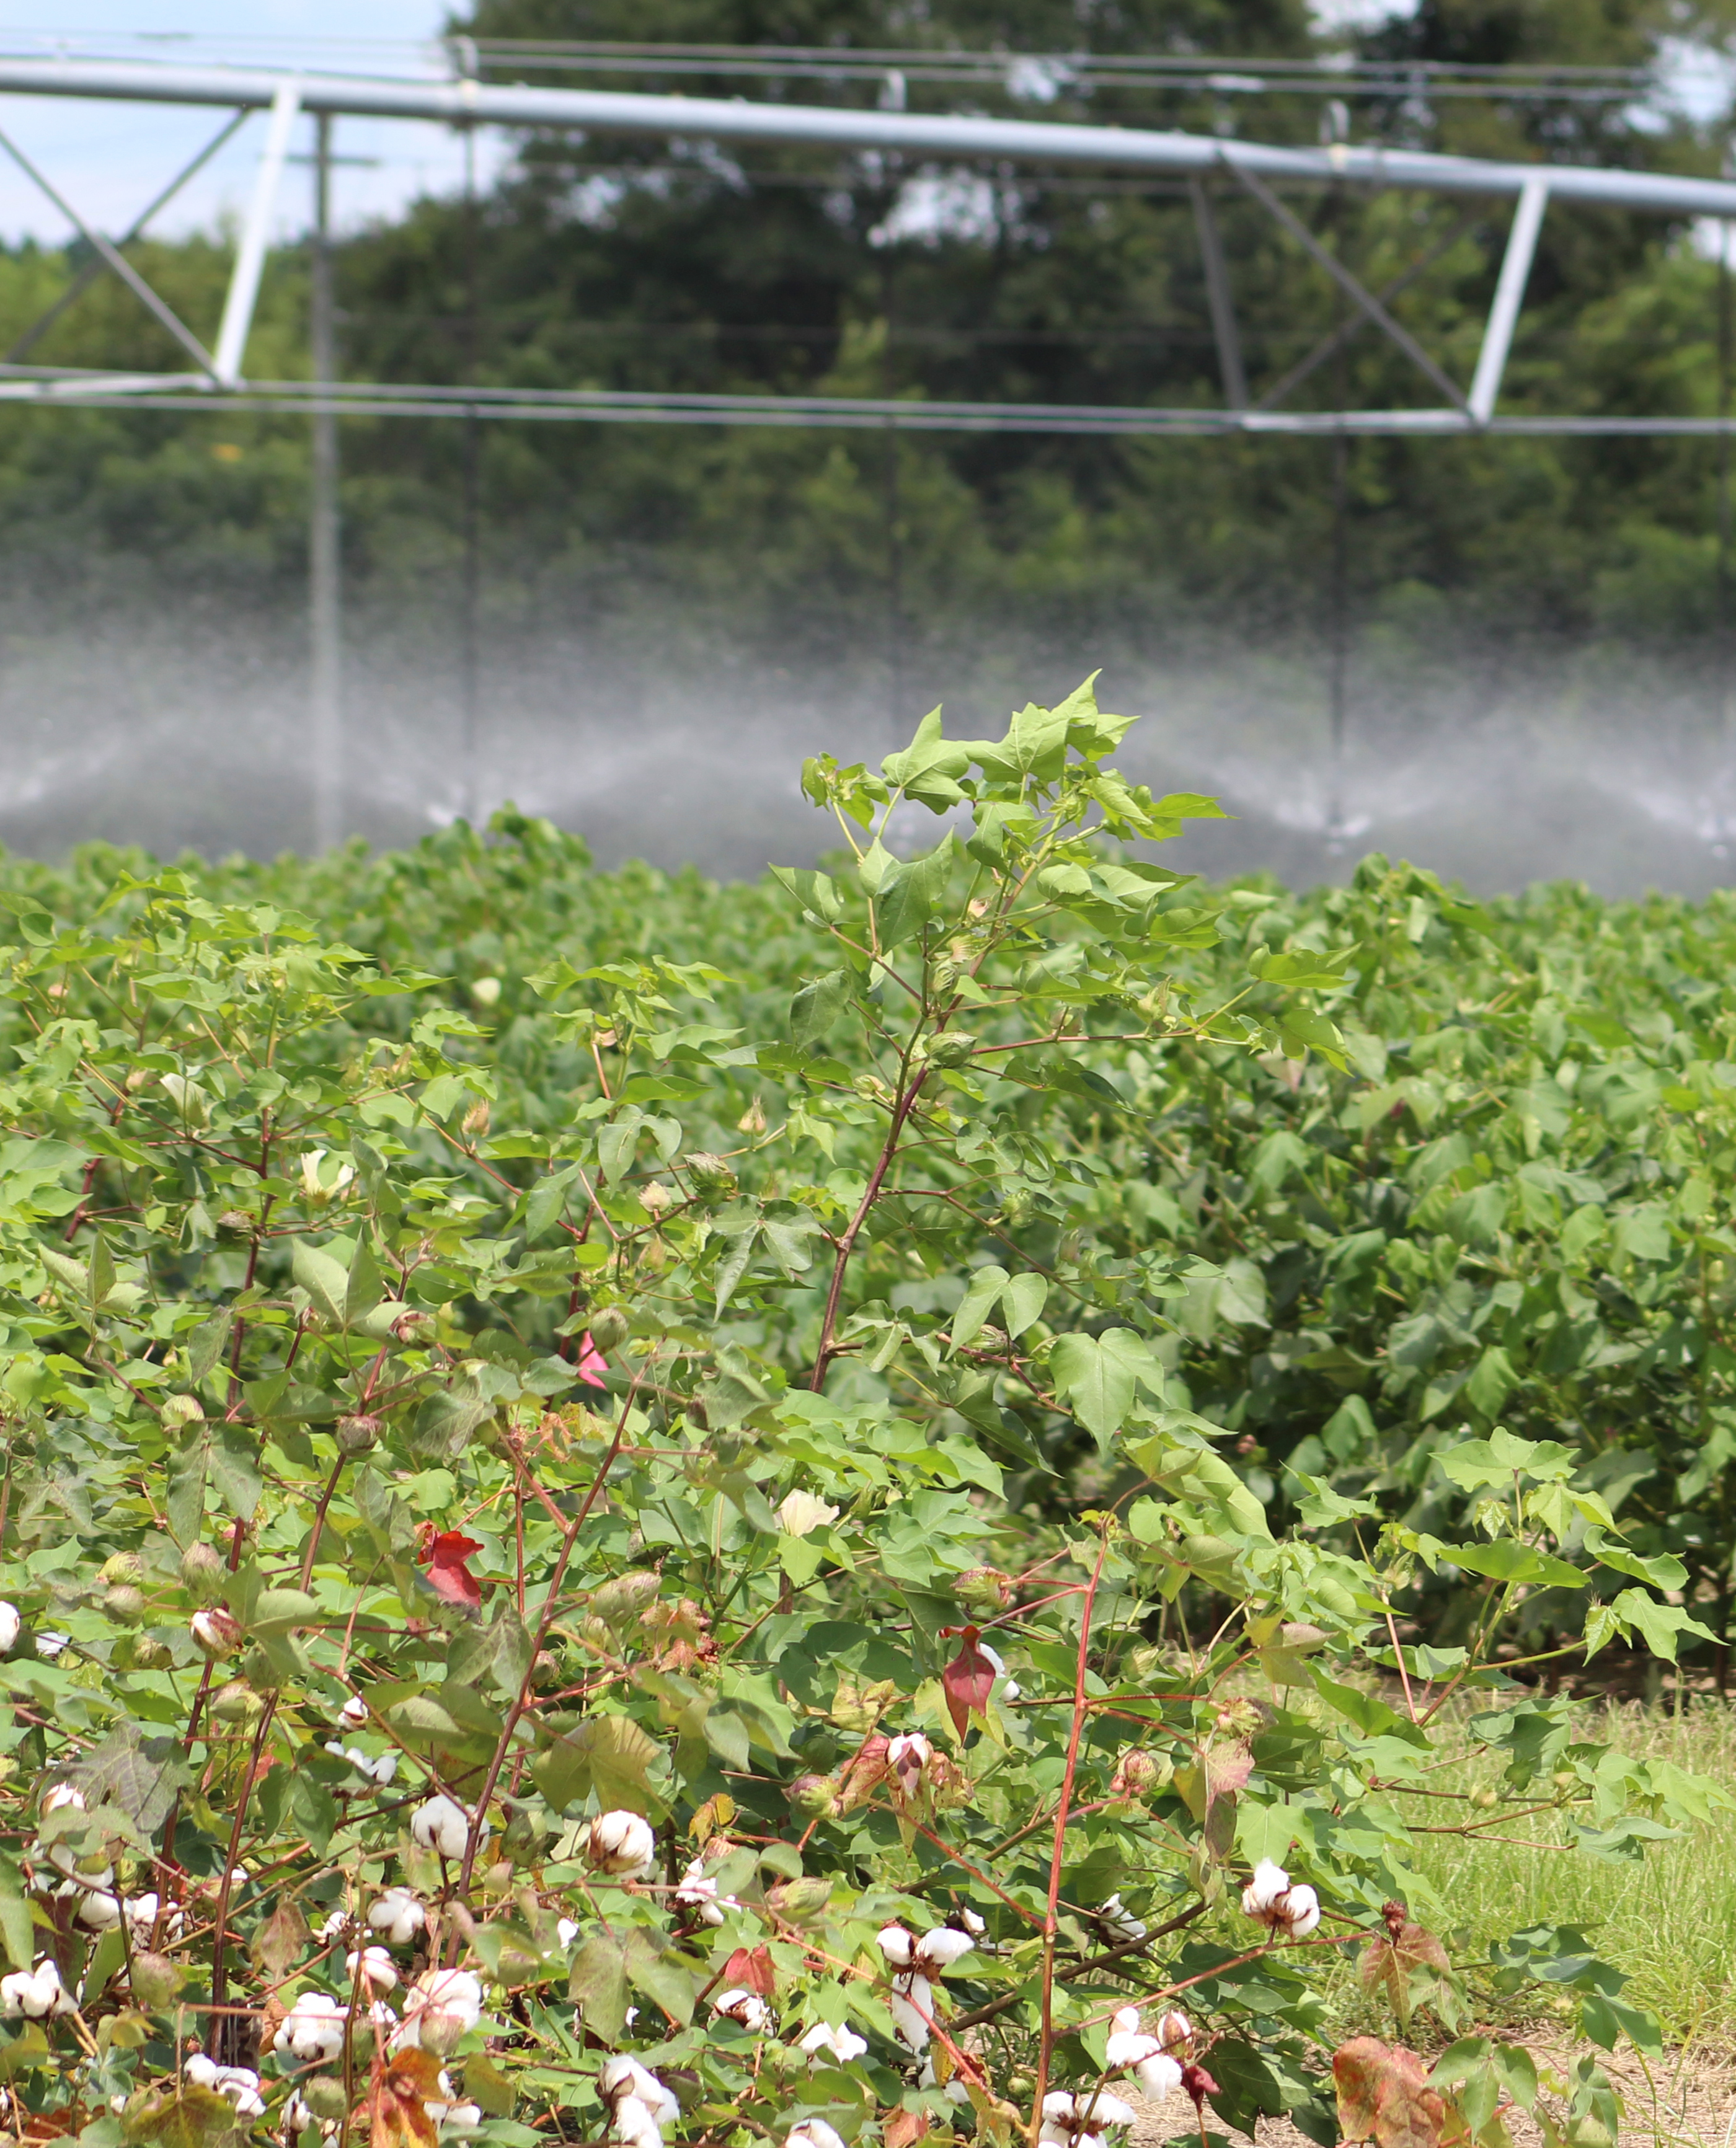 Cotton growing at the Lang Farm on the UGA Tifton campus.